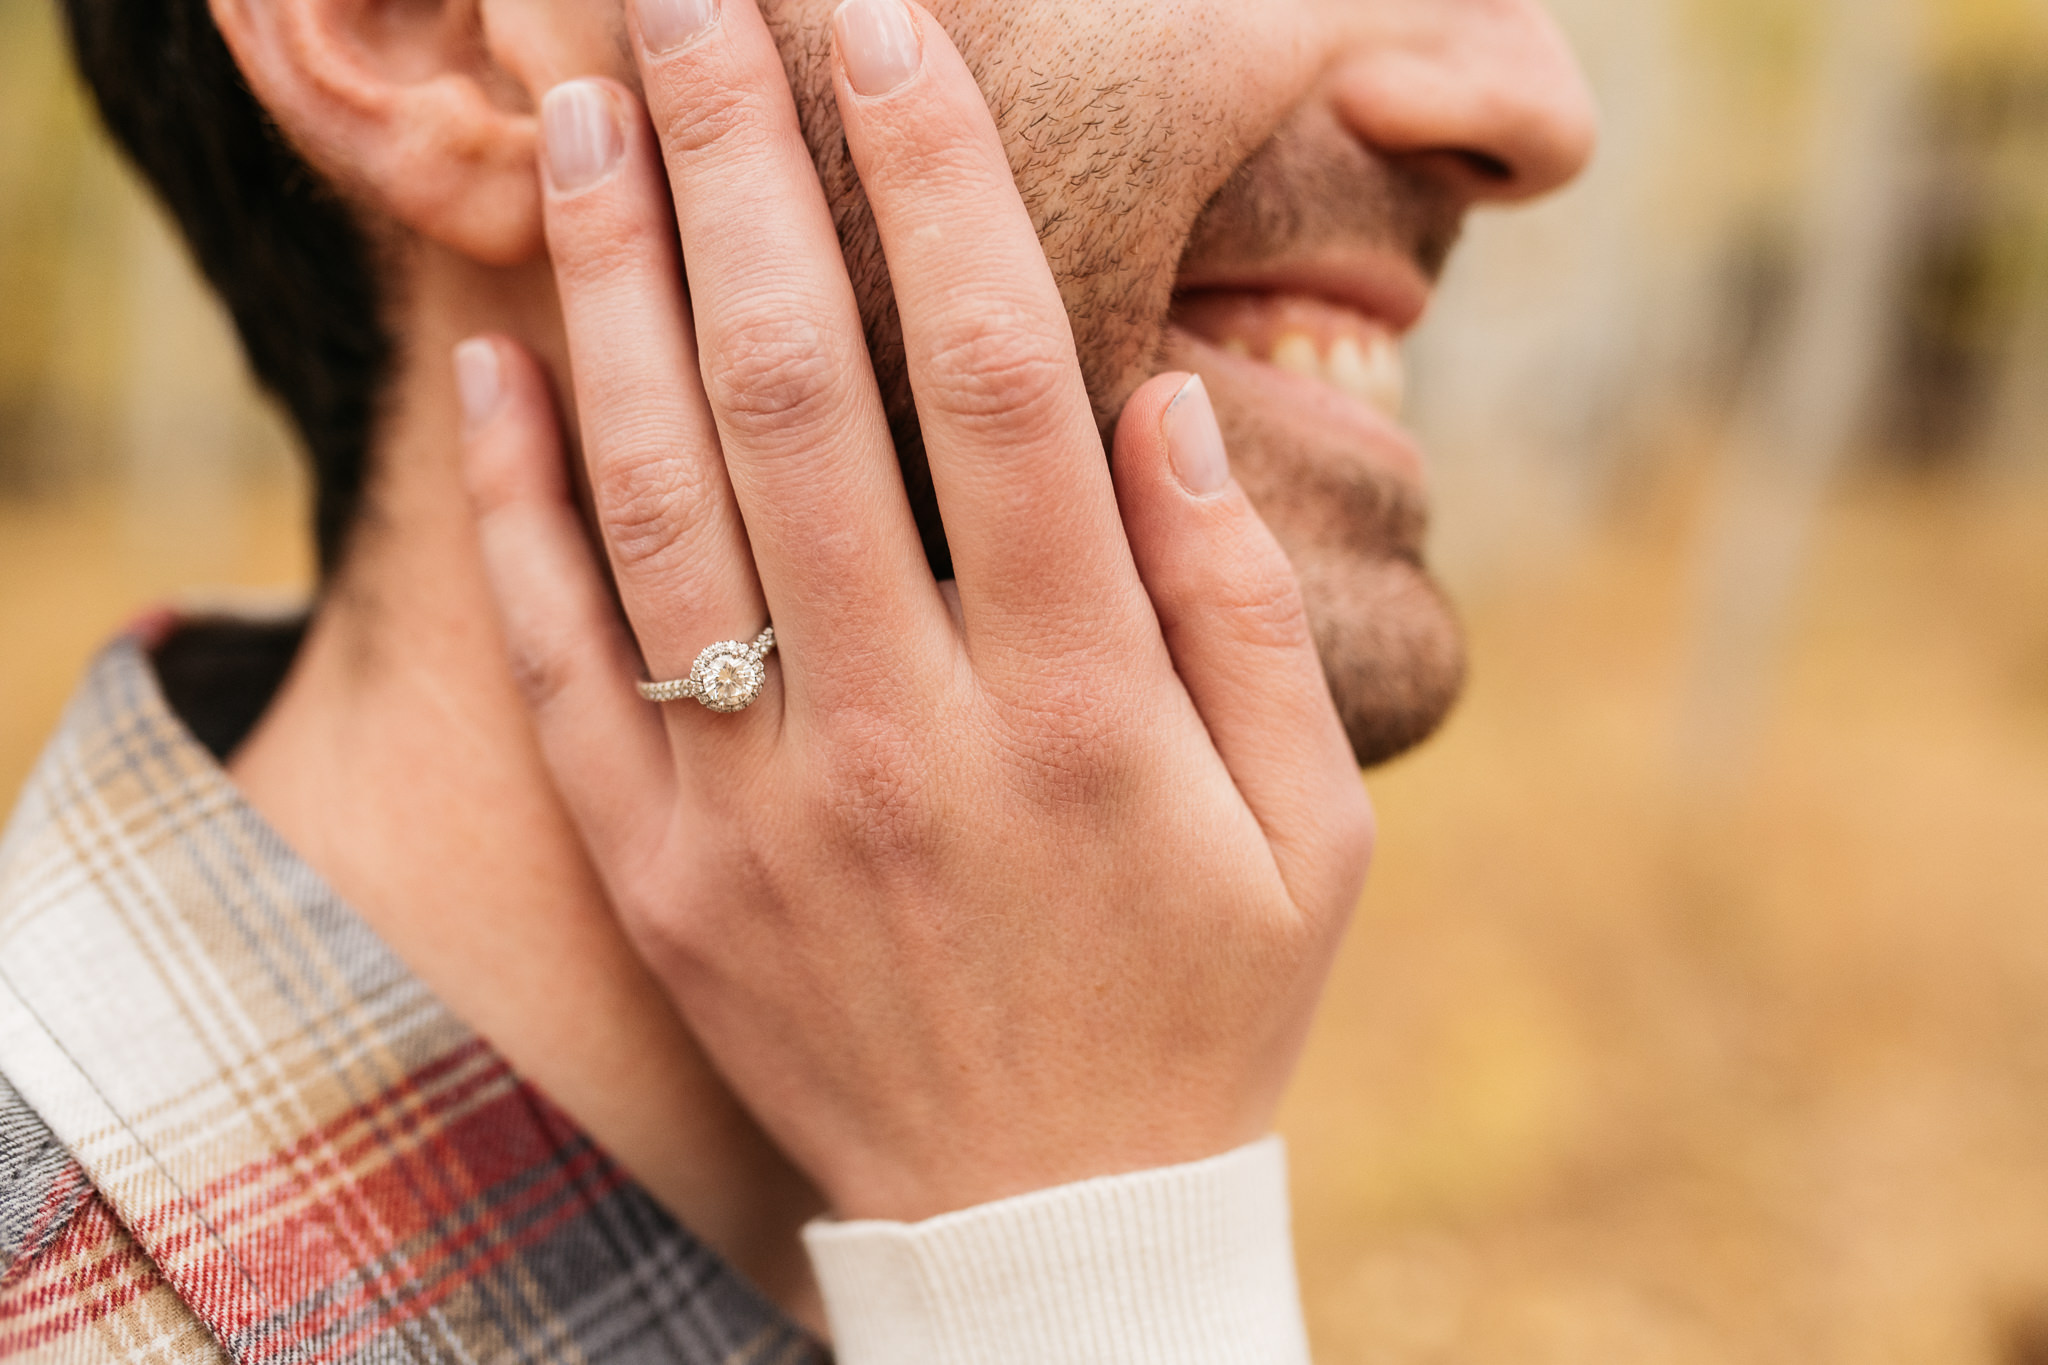 21_PRVW_Joel_Sarah_Engagements_Trevor_Hooper_Photo.jpg